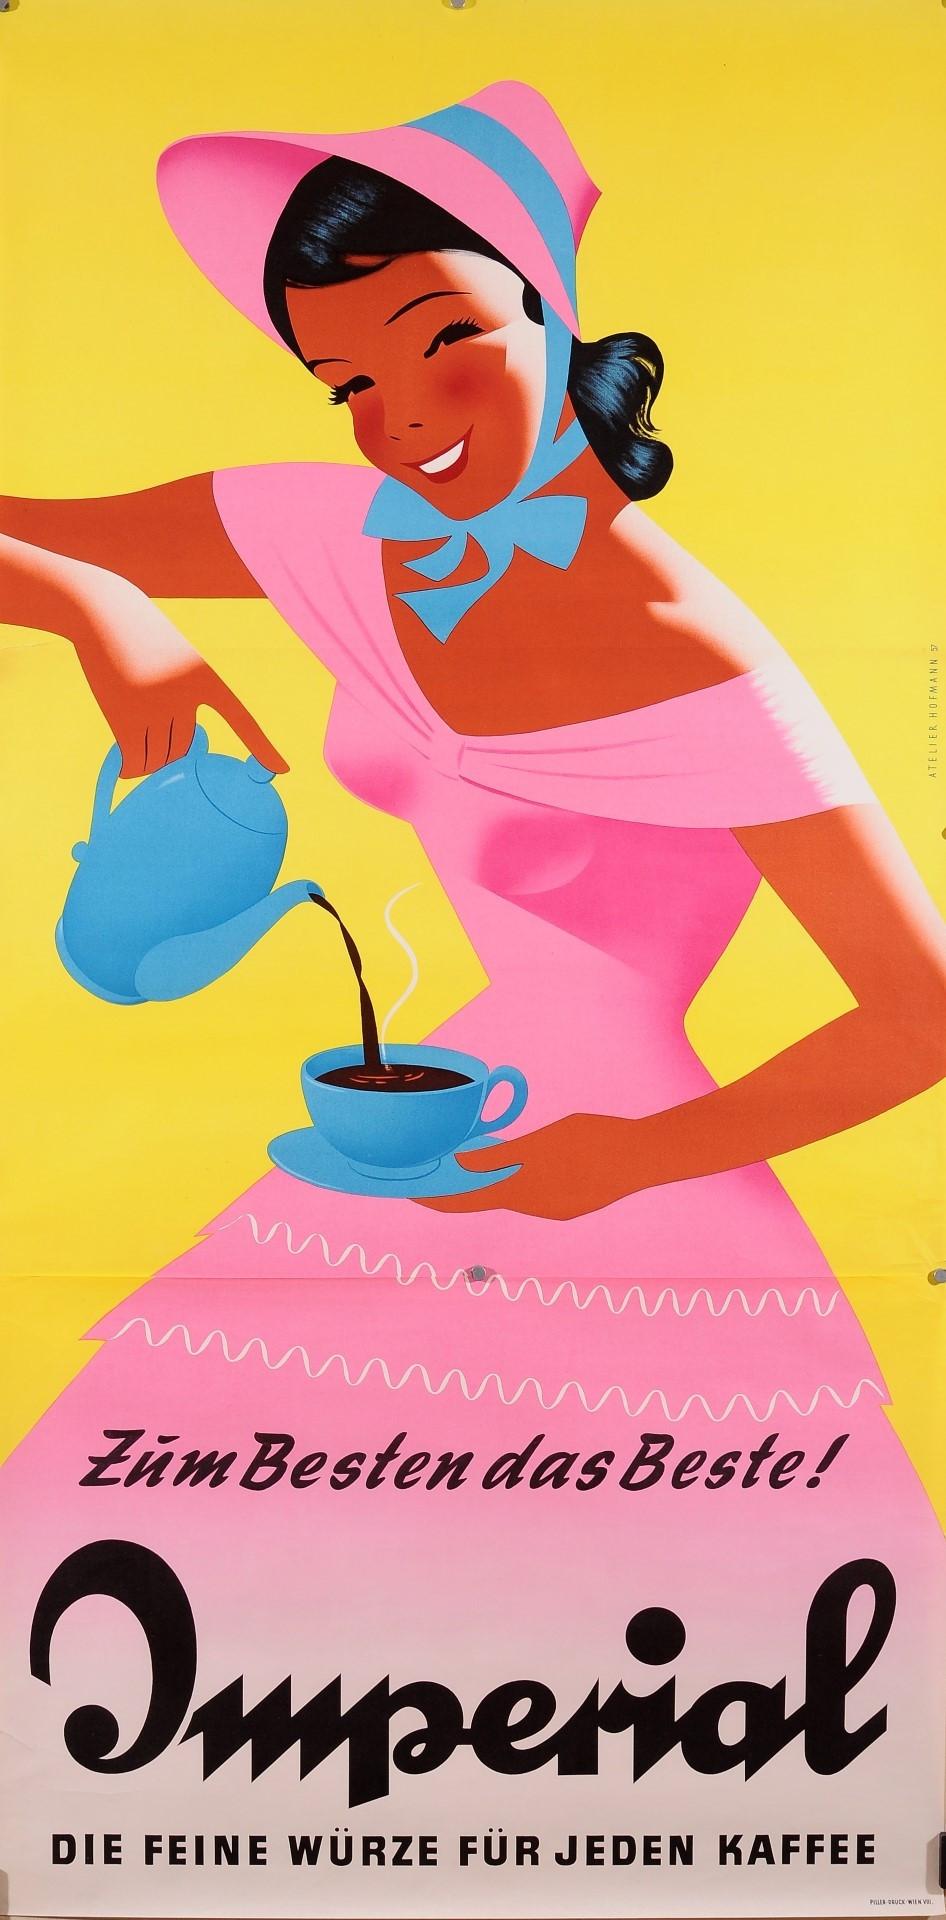 Original German Vintage Poster On Paper Advertising Coffee. 2 Parts